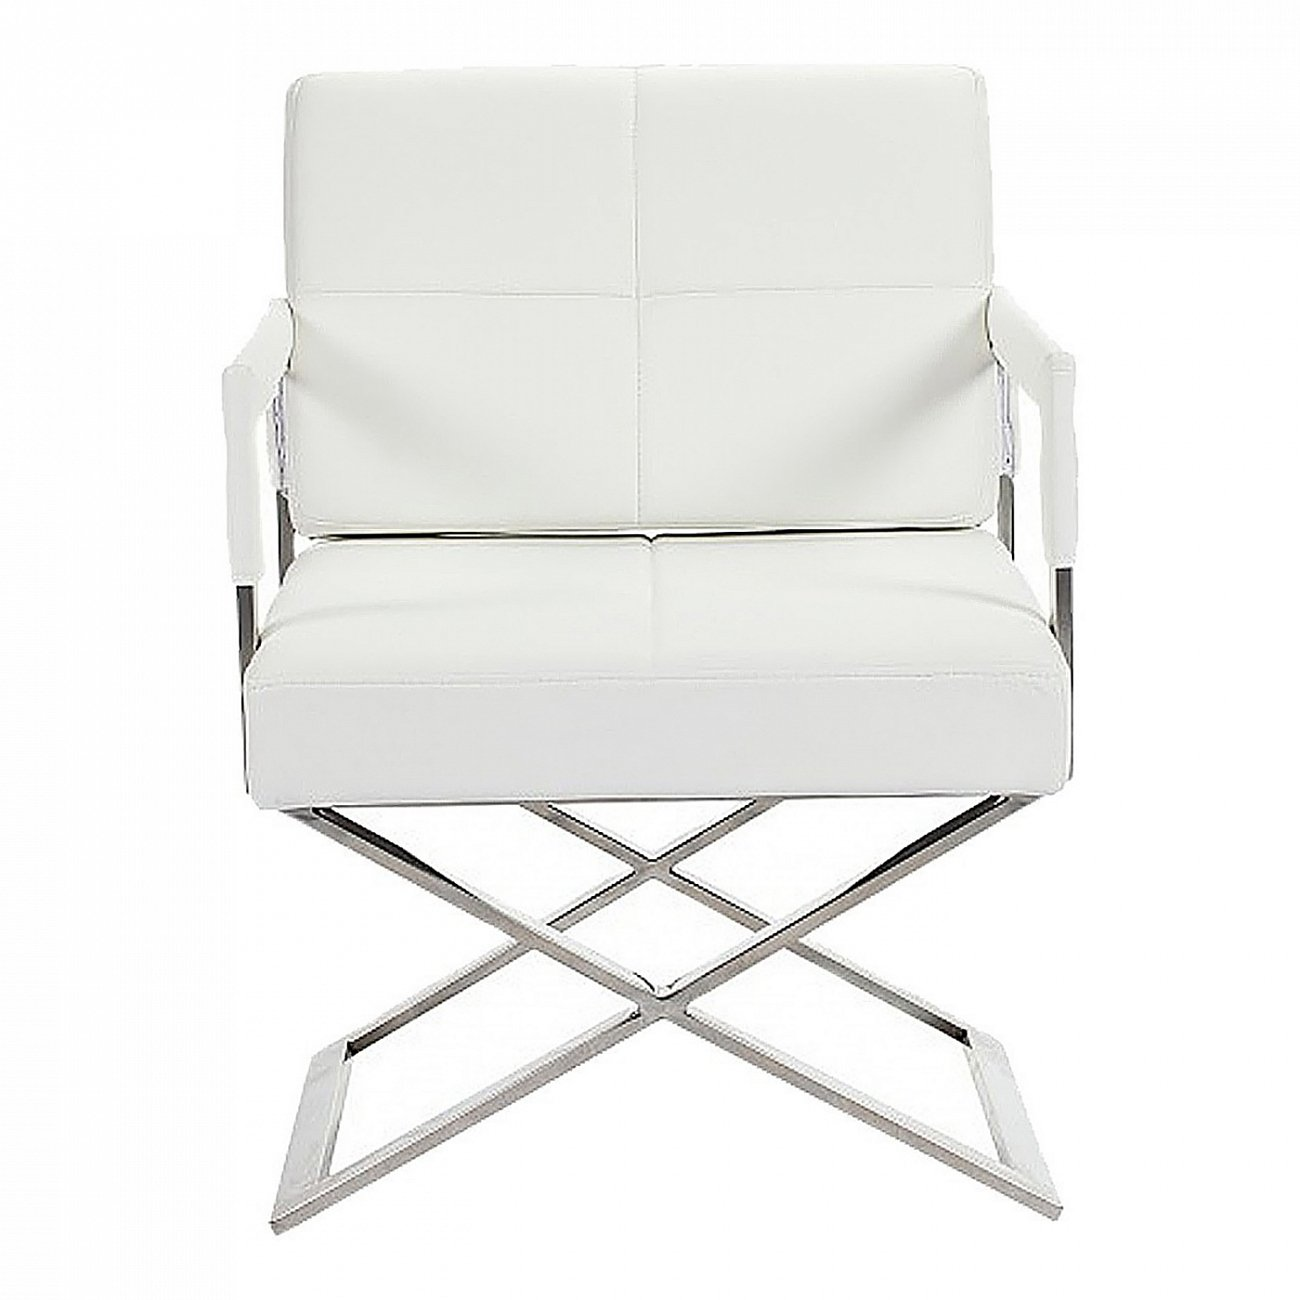 Кресло Aster X Chair Белая Кожа Класса Премиум | Кресла